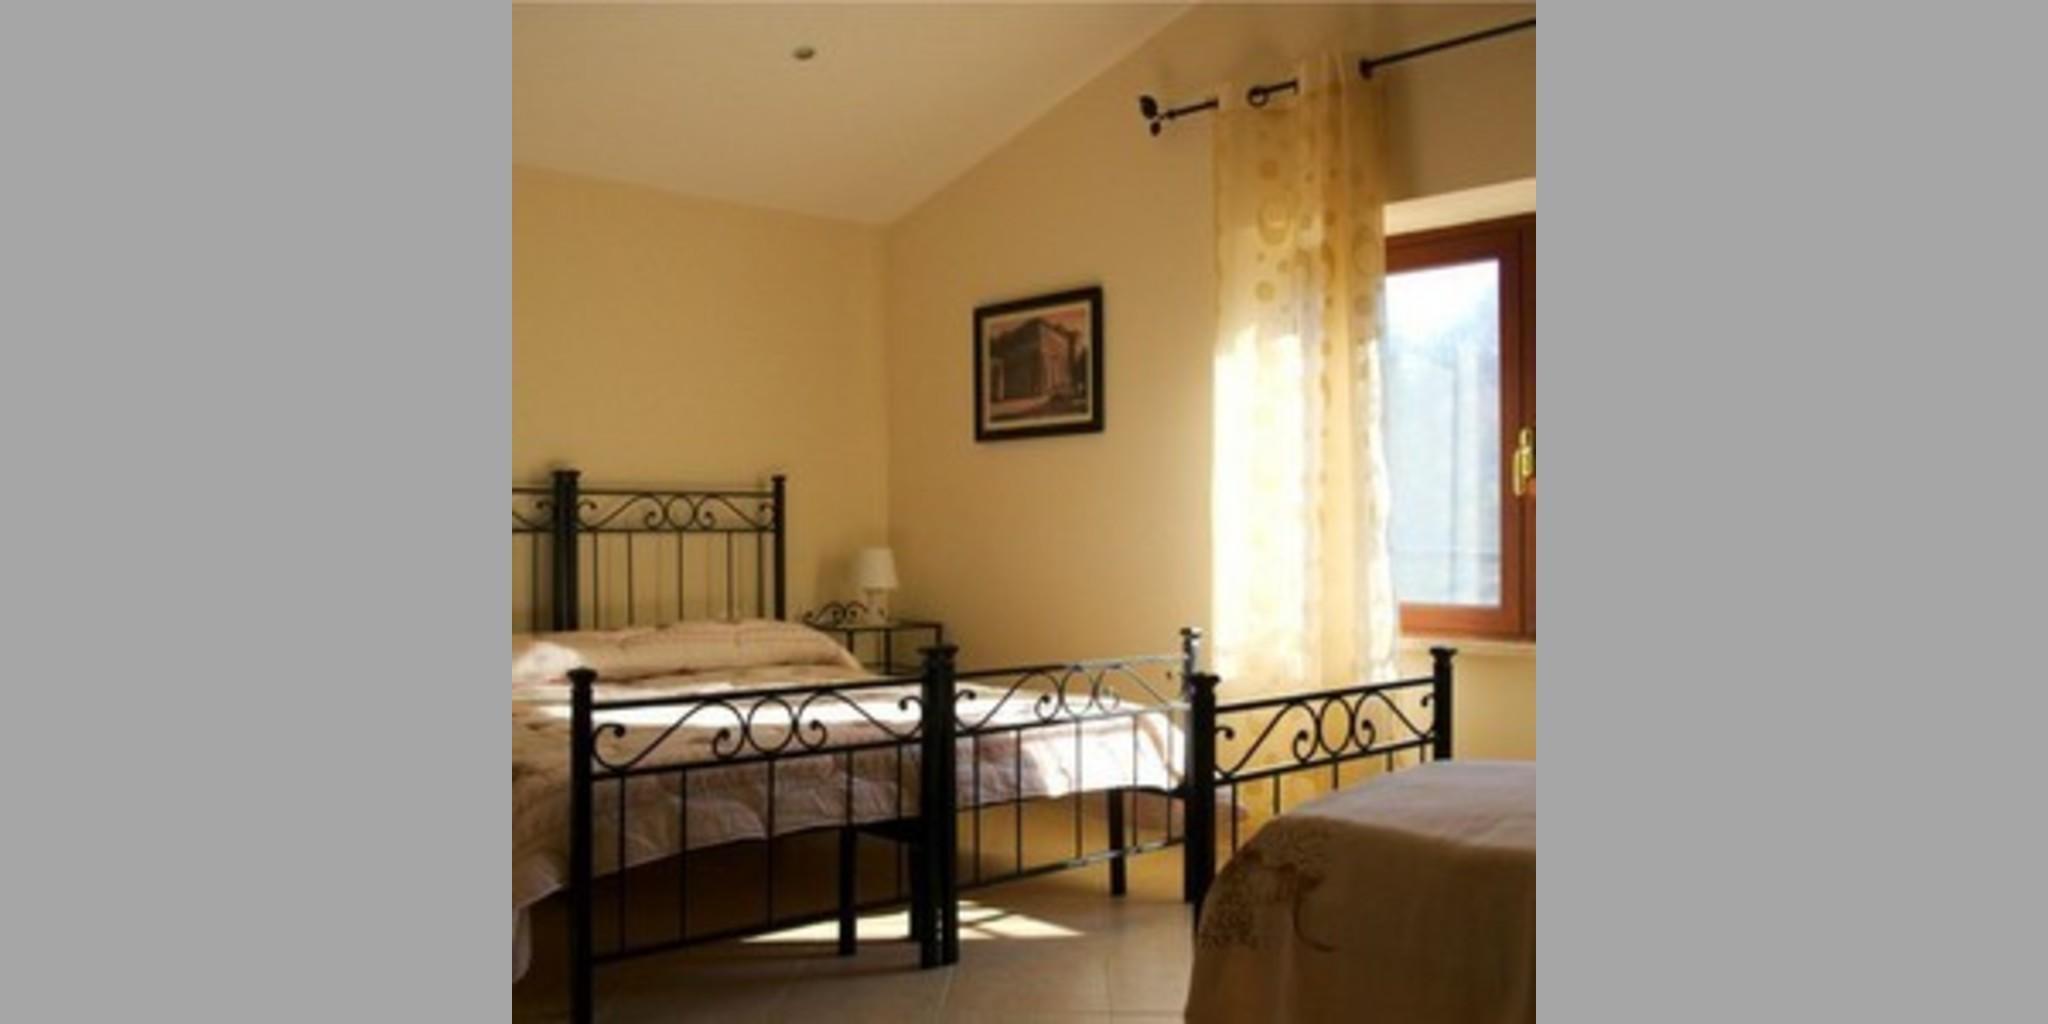 Bed & Breakfast Genazzano - Genazzano_Magicland